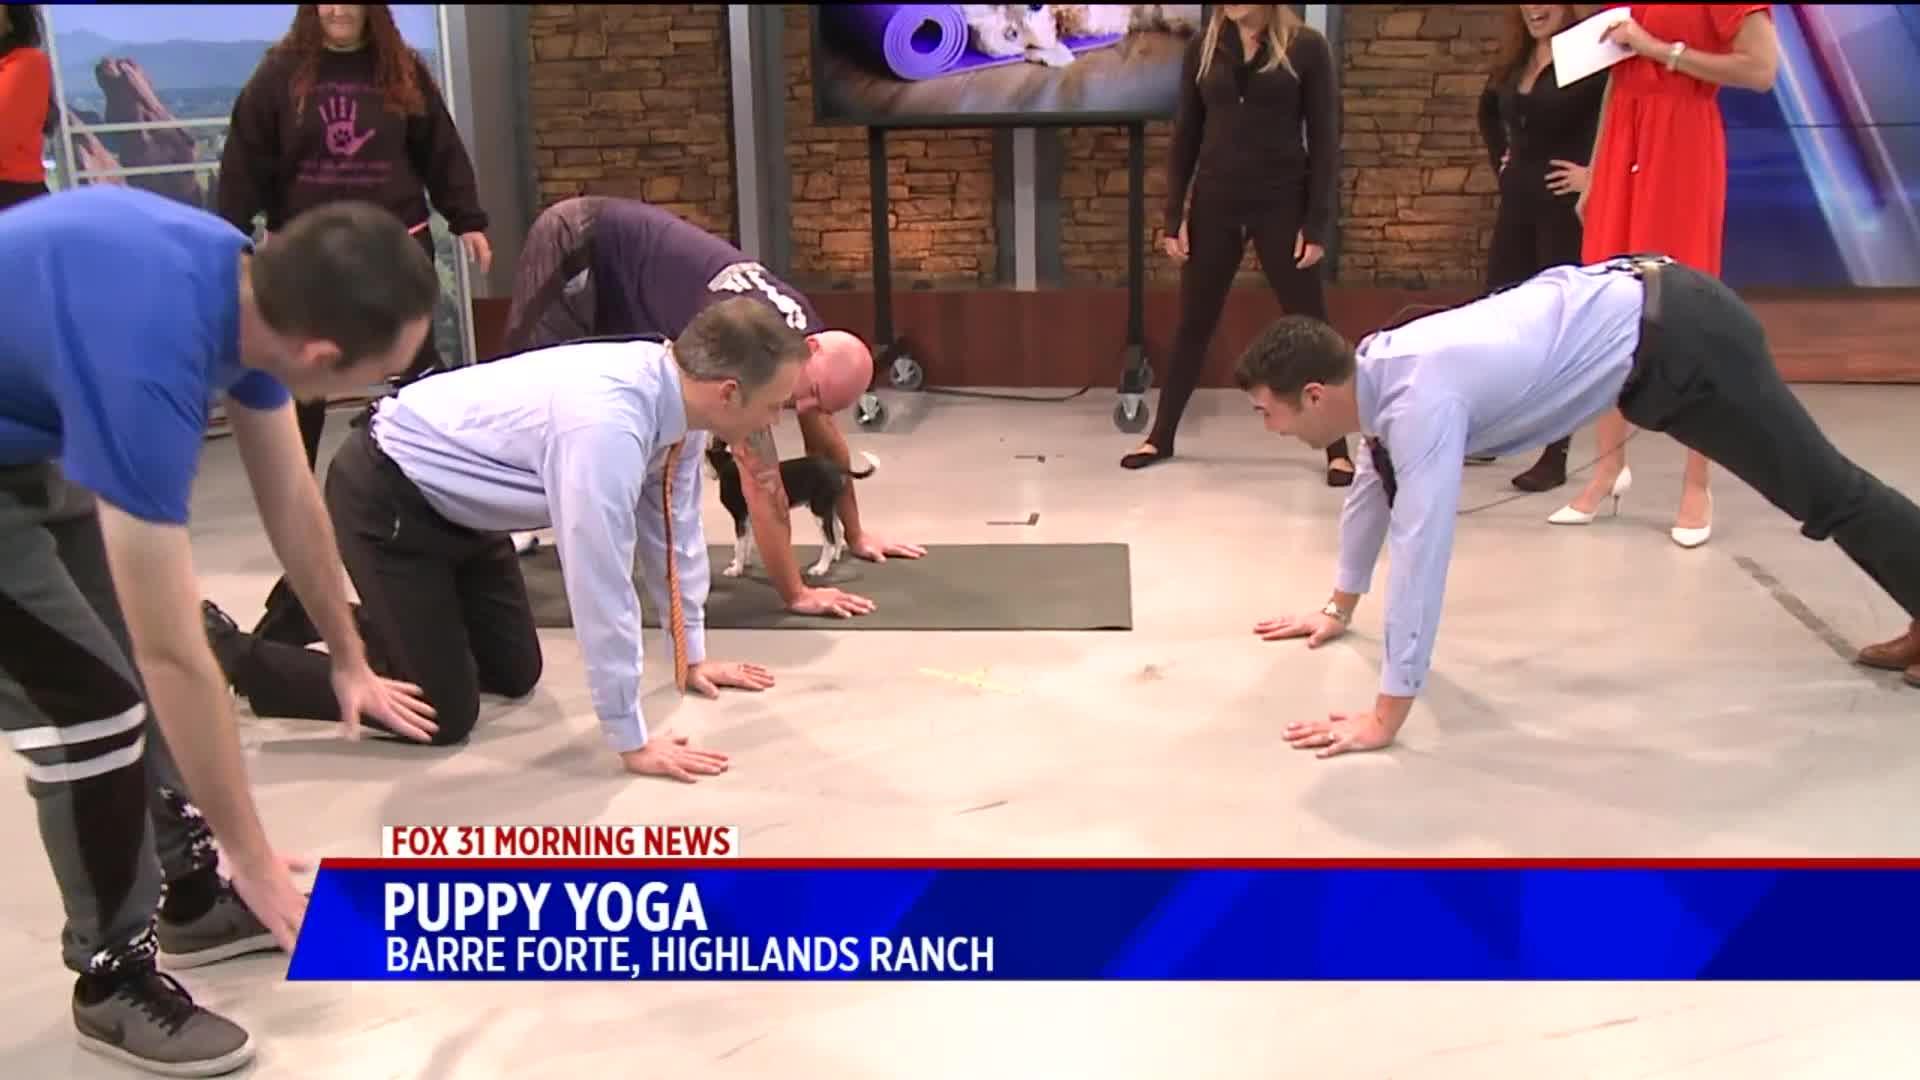 Nancy Melear, People & Blogs, lifeline puppy rescue, puppy yoga, Puppy Yoga GIFs